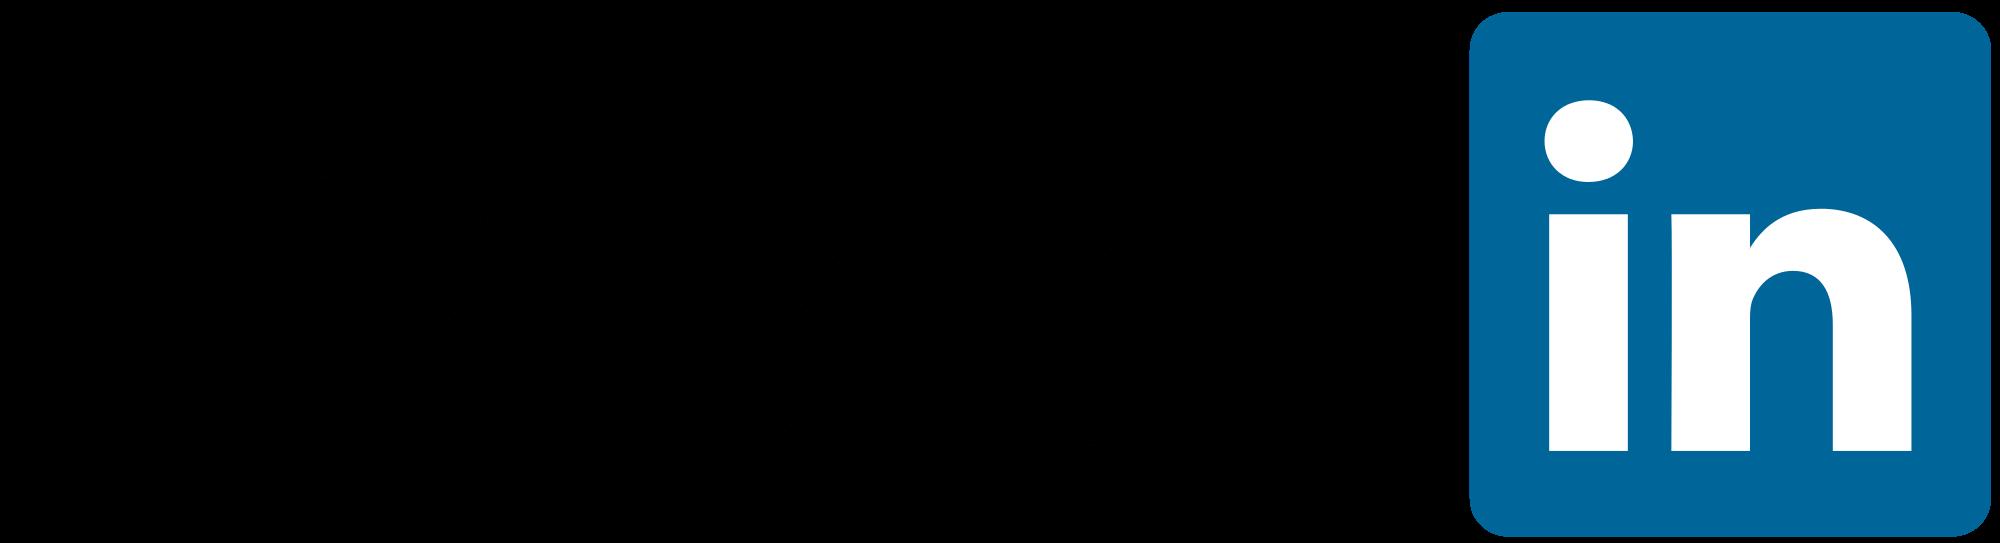 580b57fcd9996e24bc43c528.png